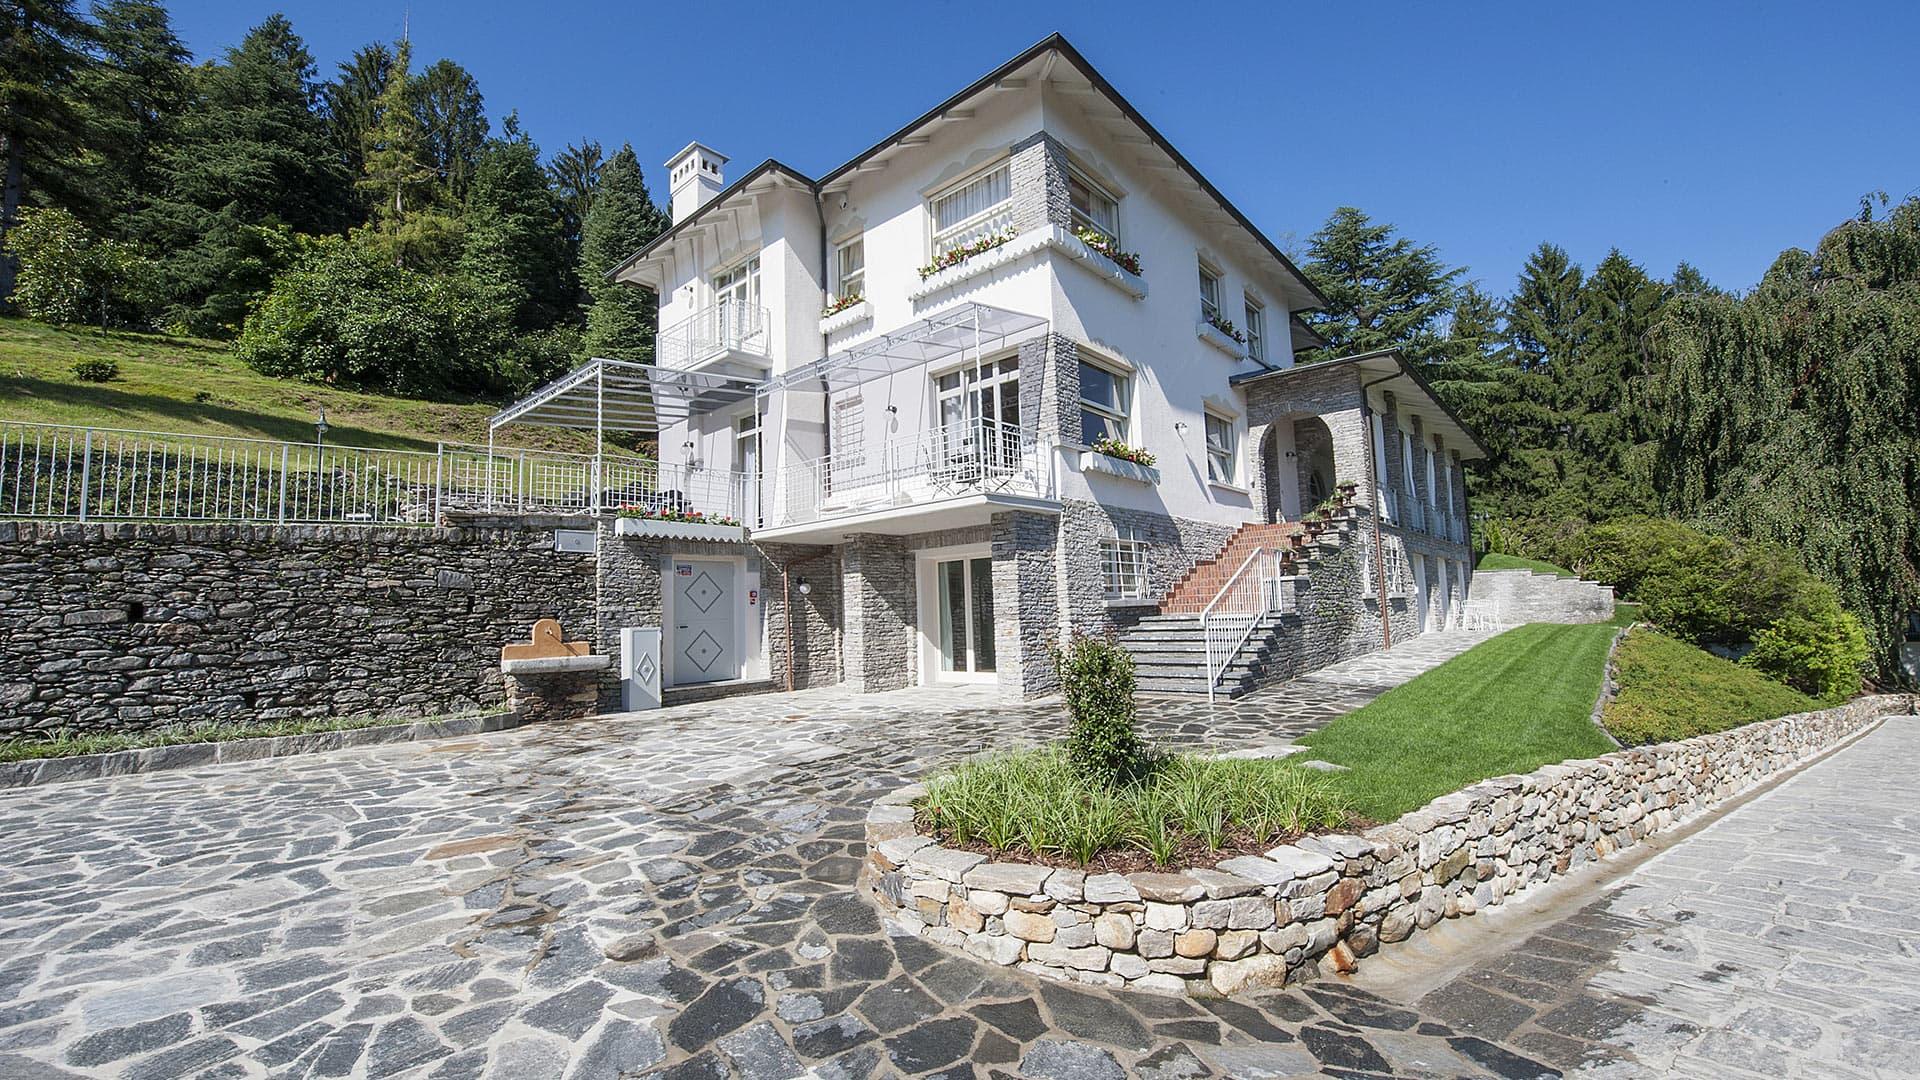 Villa Villa Emilia, Rental in Lakes